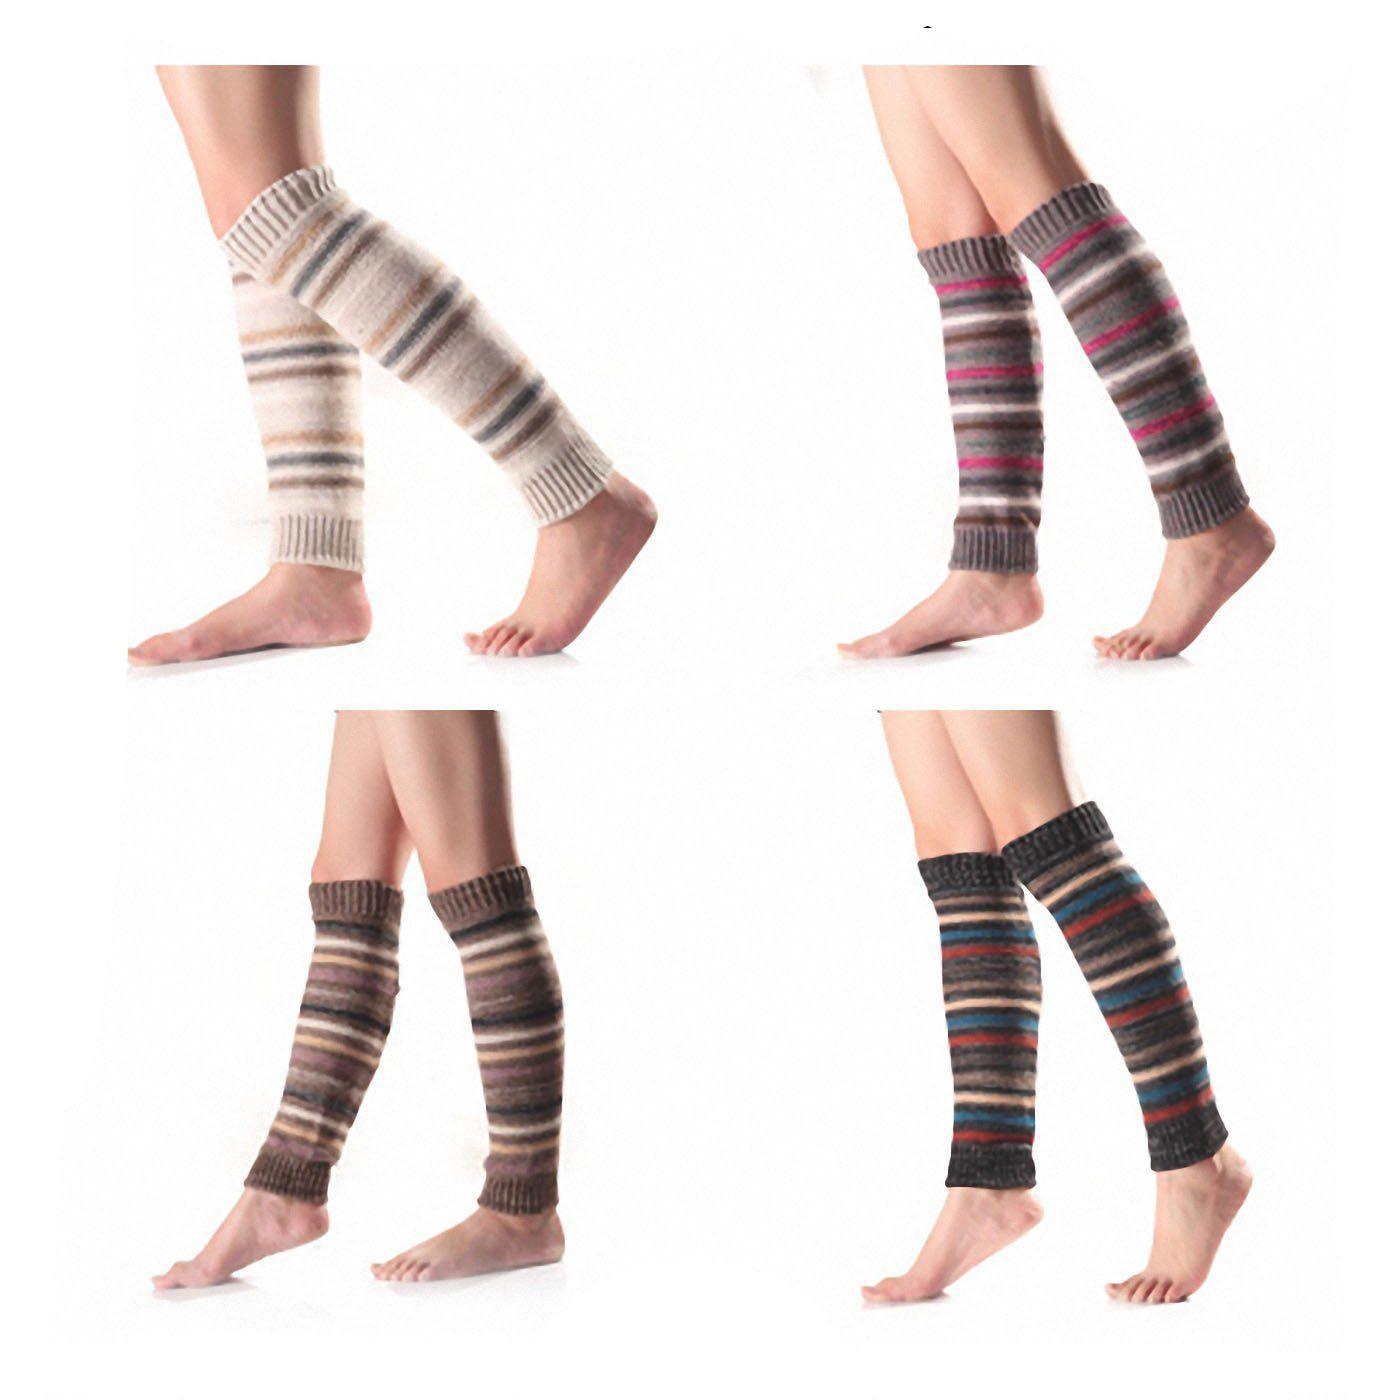 ed49eb4a4ce 4 Pack Women Leg Warmer Crochet Knit Boot Socks Topper Cuff. 4 pack Leg  Warmer